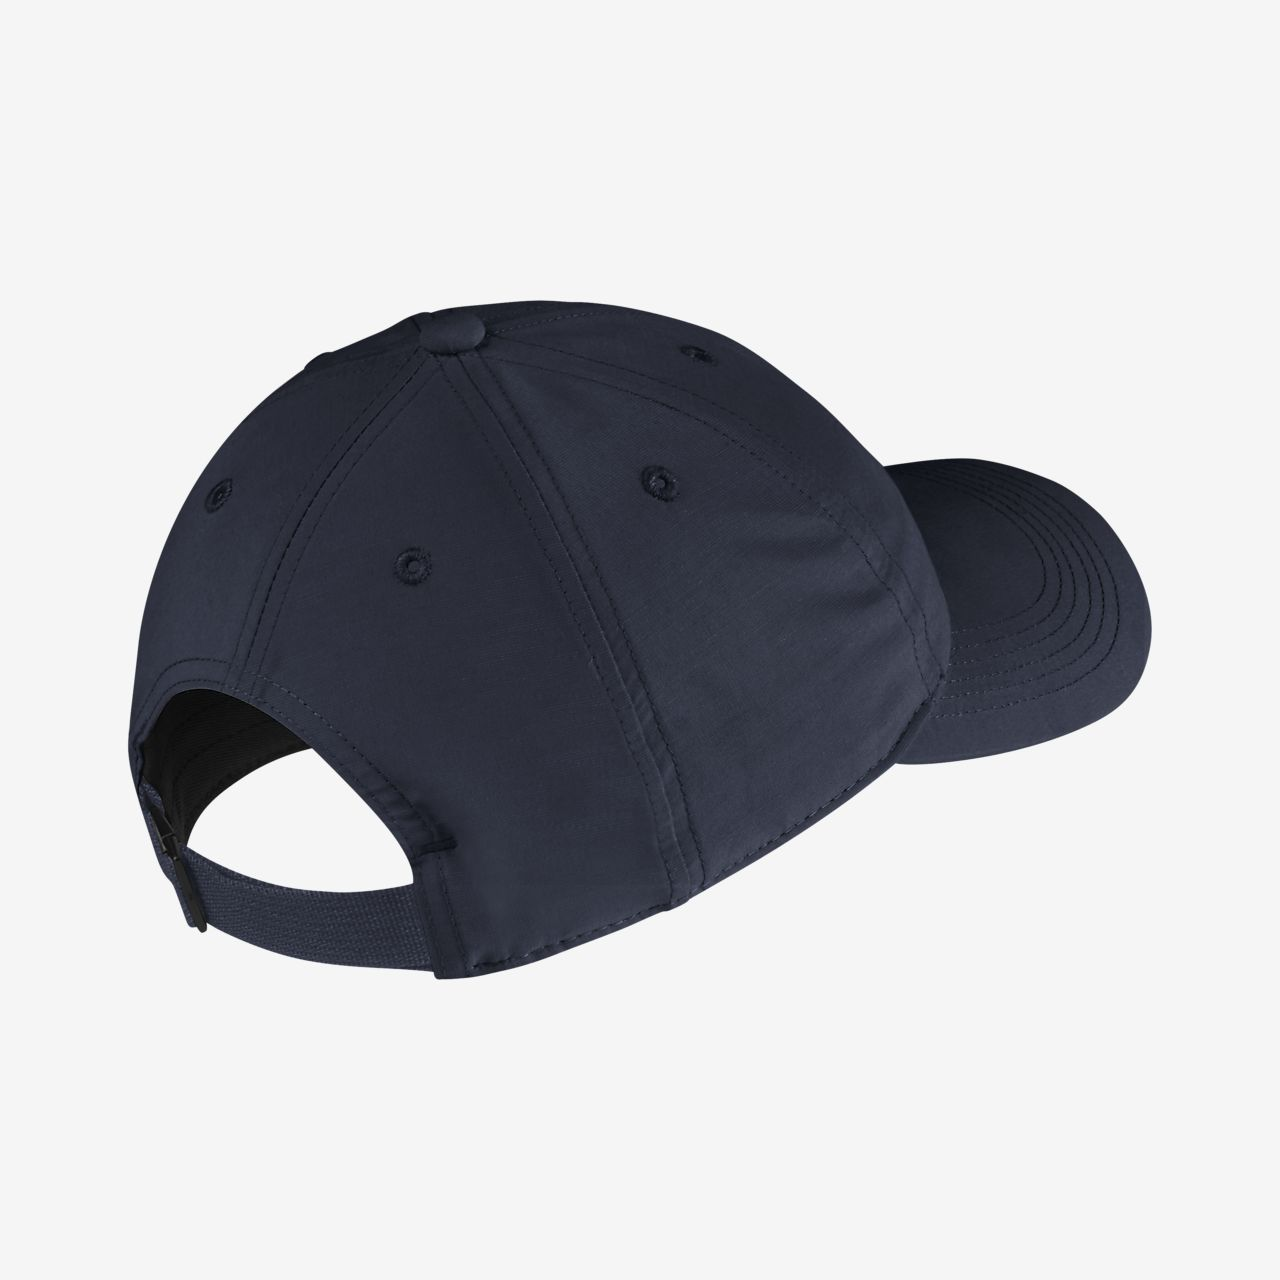 ee373bc22e6 Nike Metal Swoosh Older Kids  Adjustable Hat. Nike.com GB